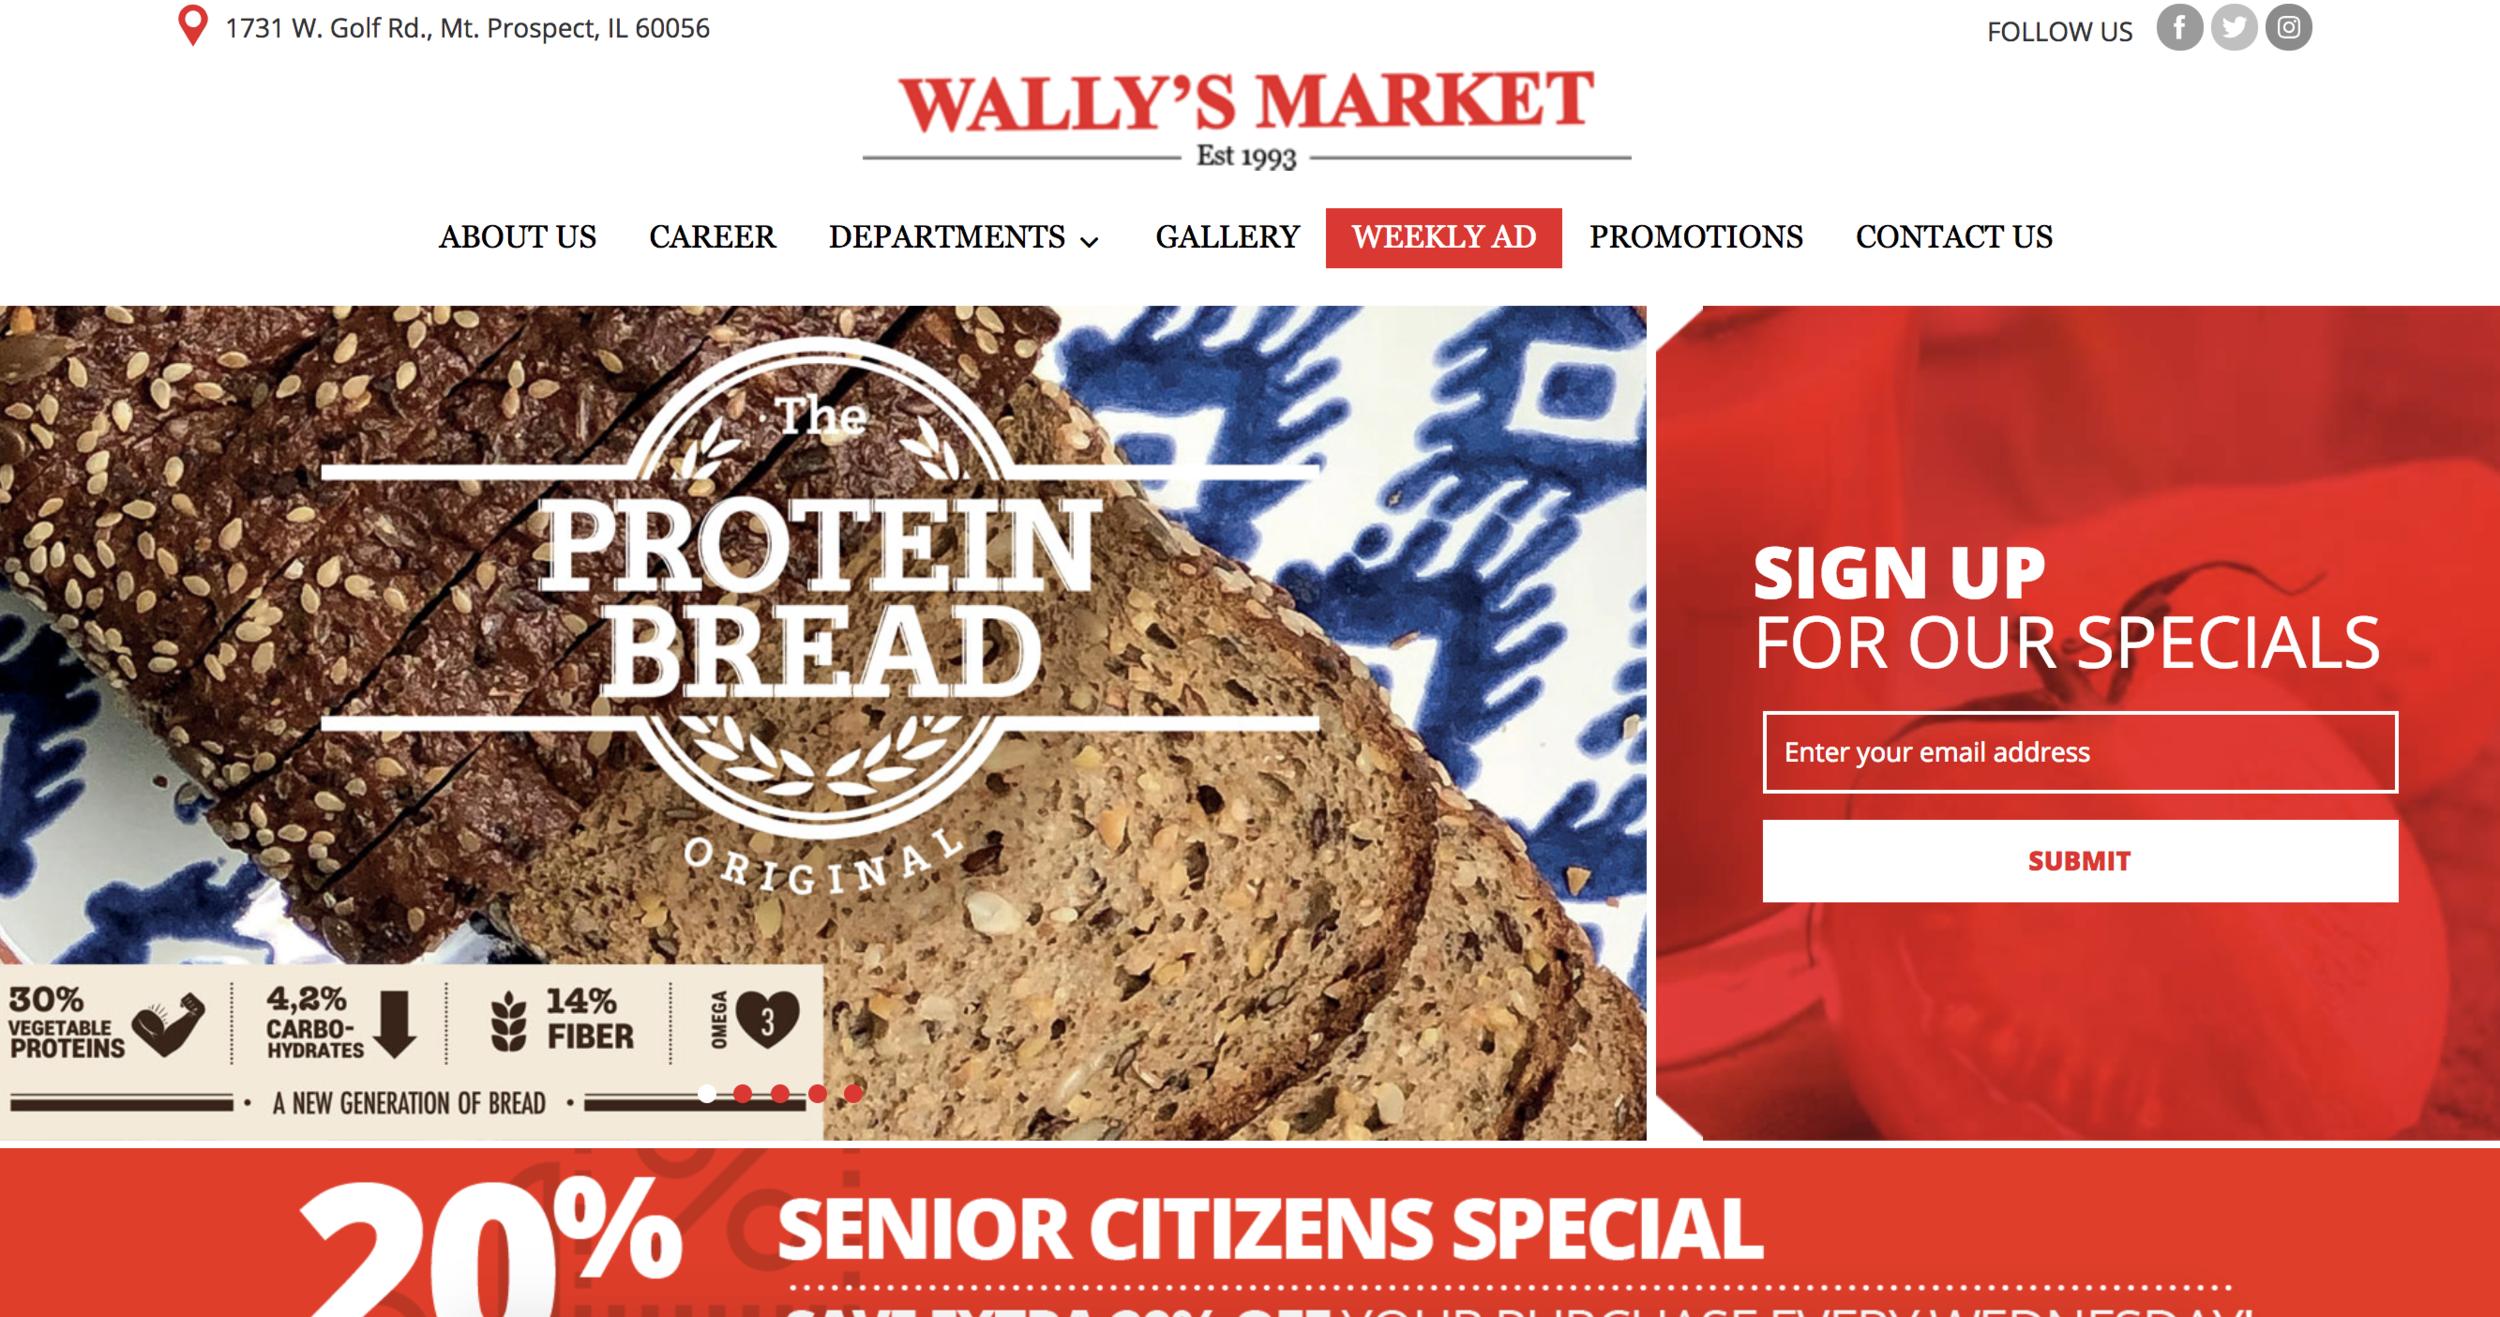 Wally's Market | 1731 W. Golf Rd., Mt. Prospect, IL 60056 | 847.364.2929